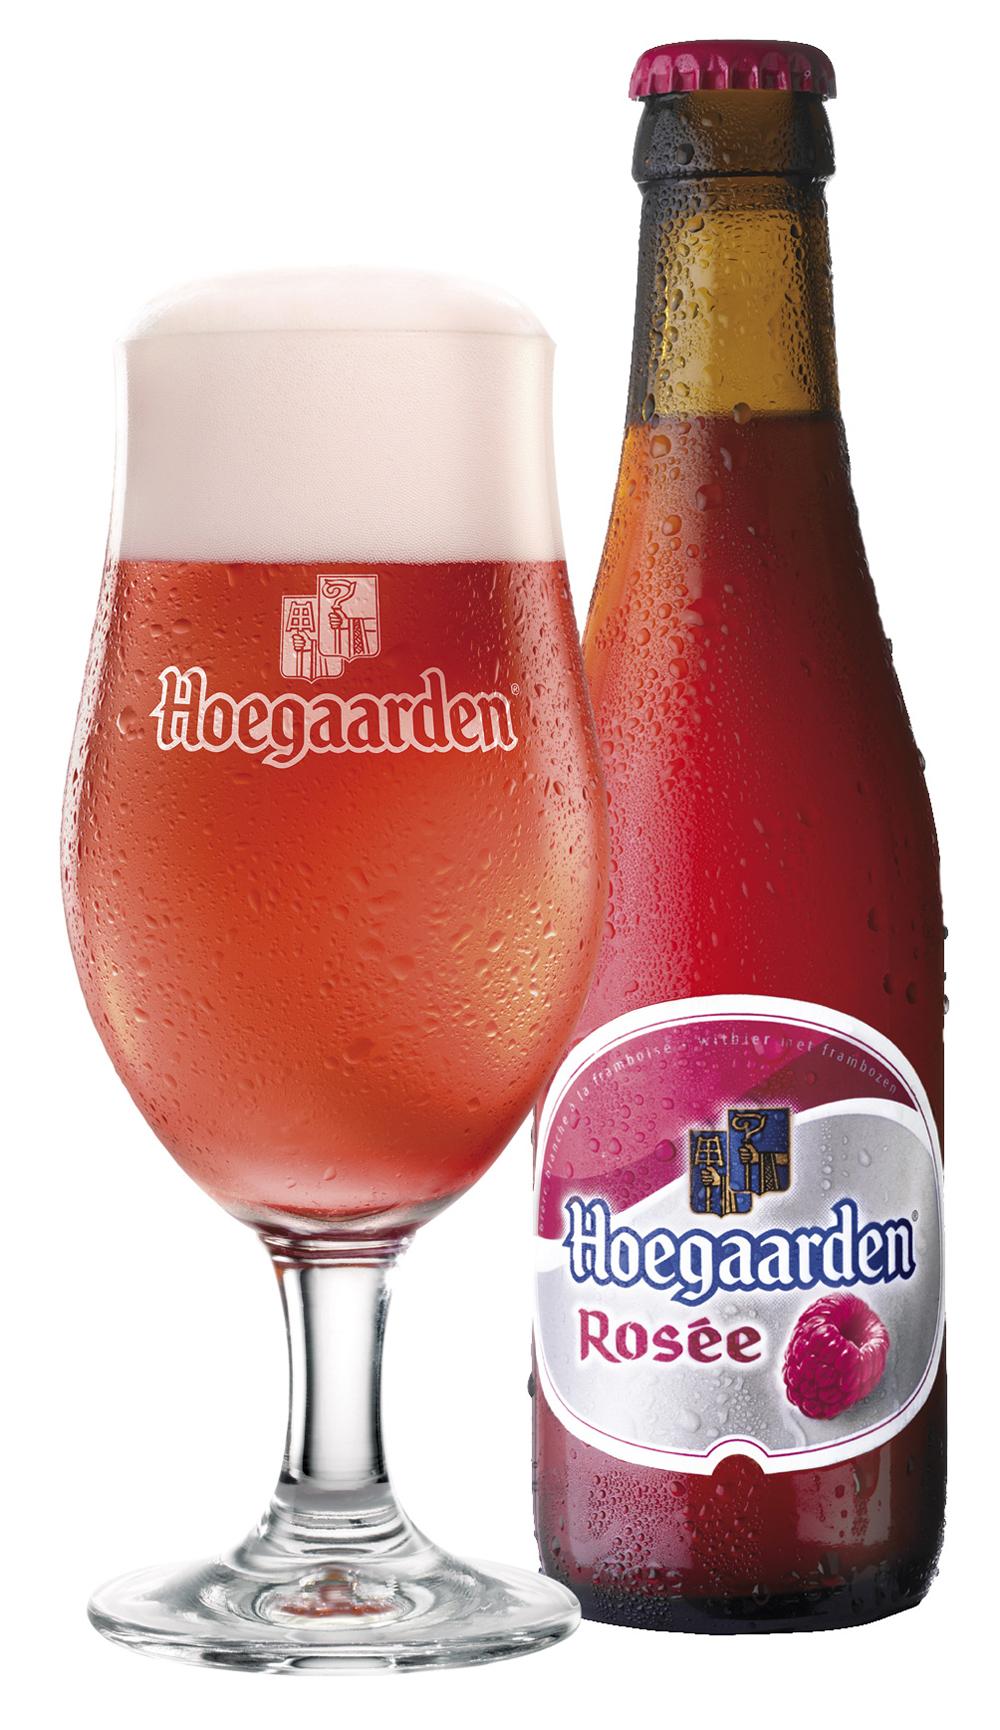 Фото: пиво «Hoegaarden Rosee» («Хугарден Розе»)